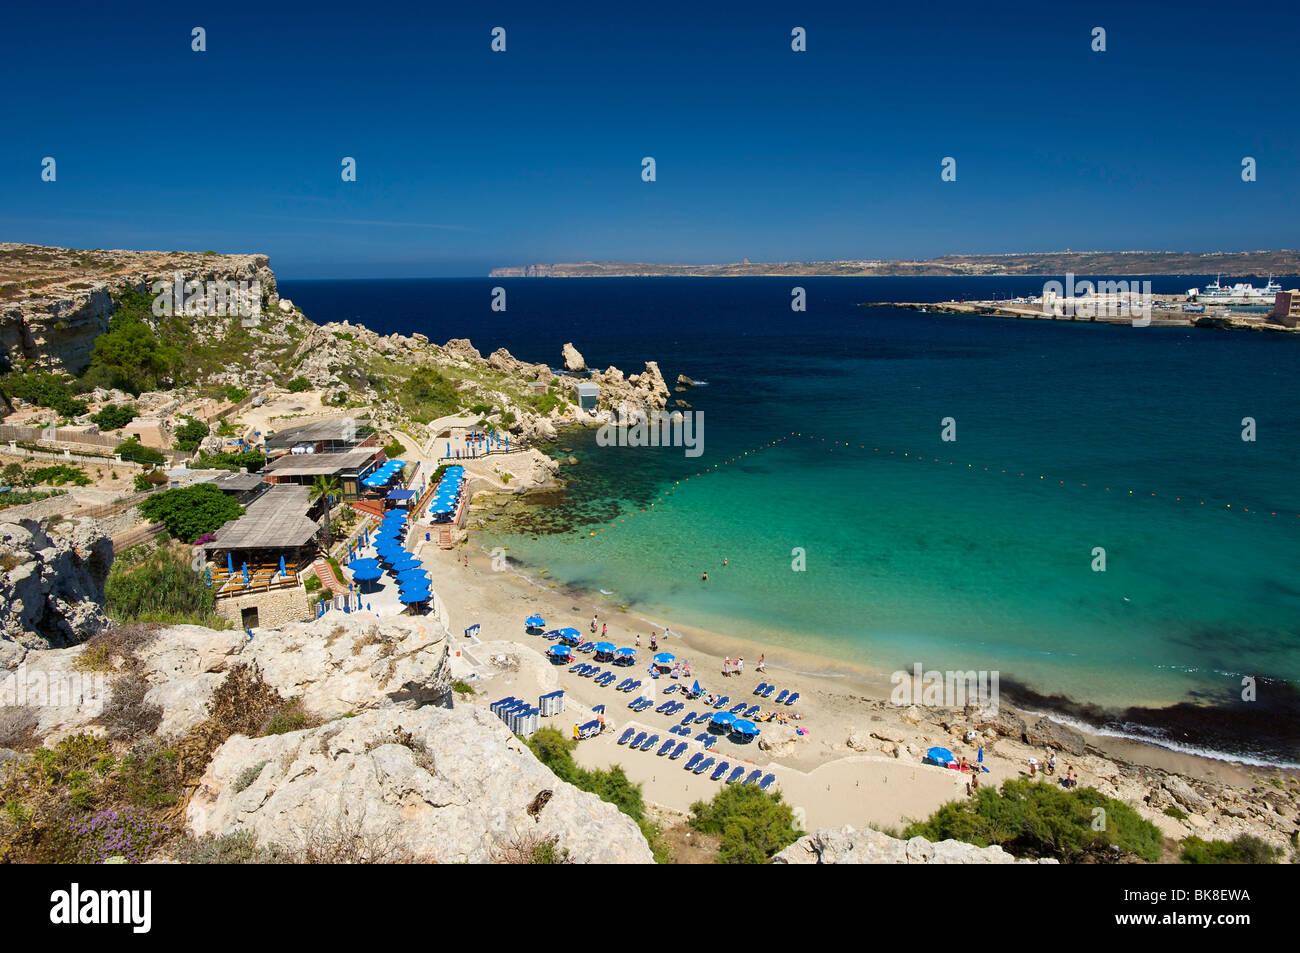 Paradise Bay in Cirkewwa, Malta, Europe - Stock Image